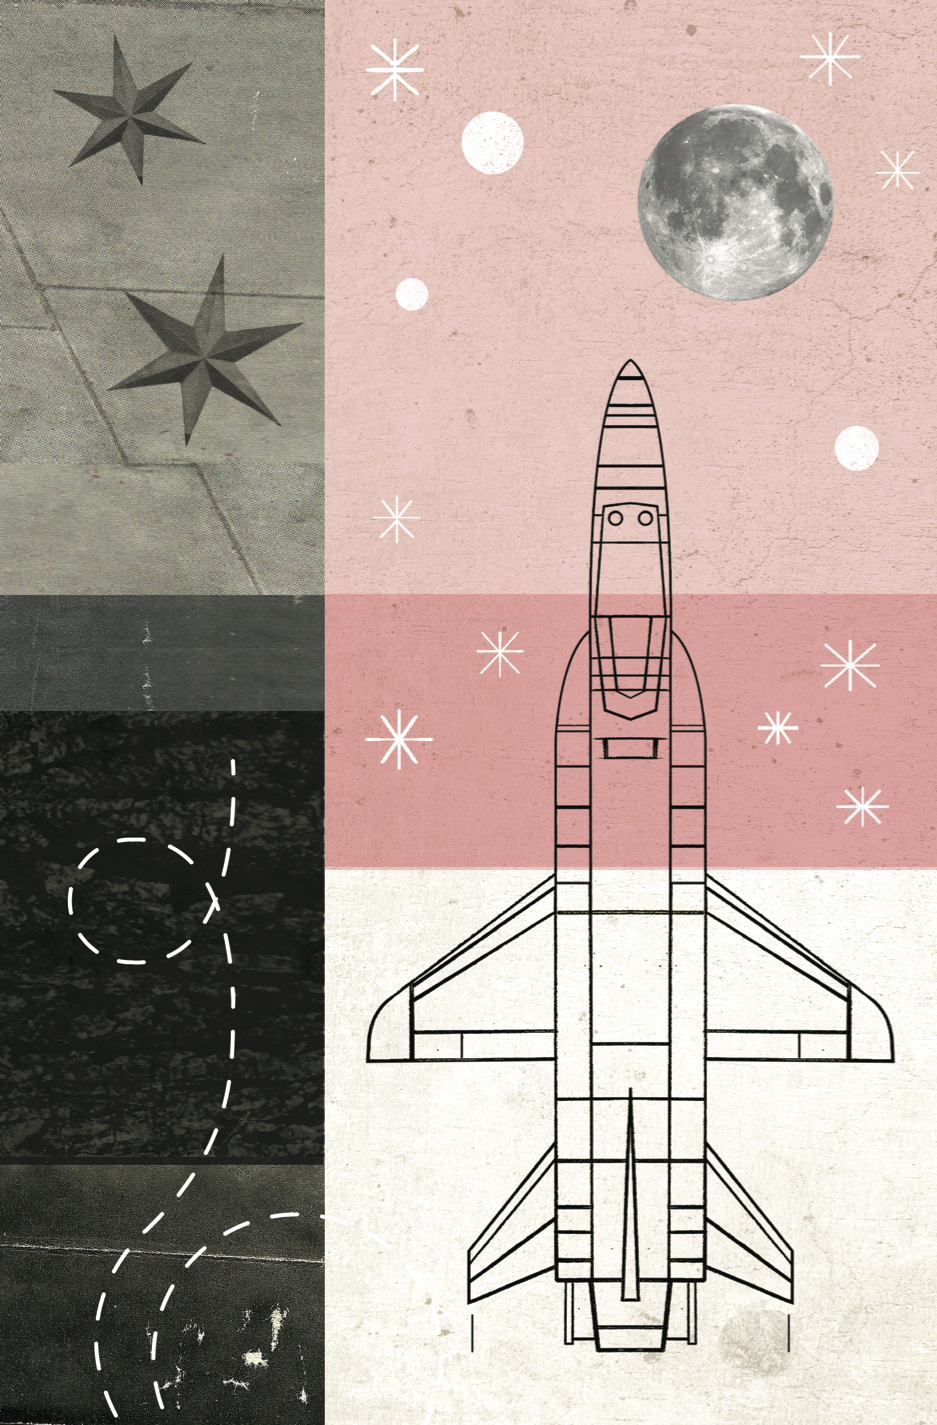 Devours || Illustration by Danielle Jette for Discorder Magazine